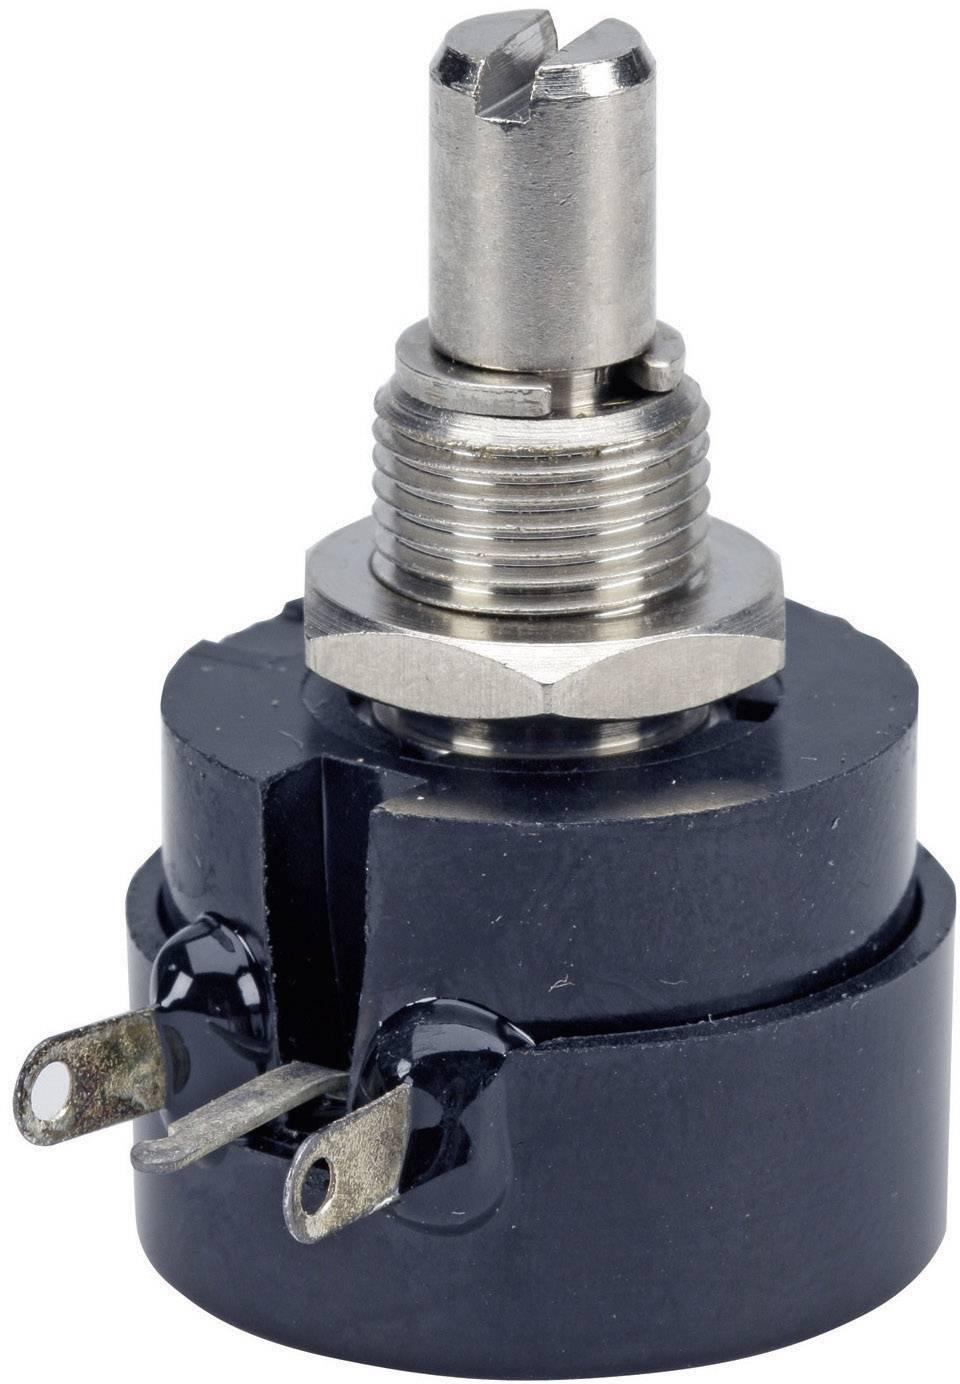 Drôtový potenciometer mono TT Electronics AB 3101106130 3101106130, 0.5 W, 500 Ohm, 1 ks